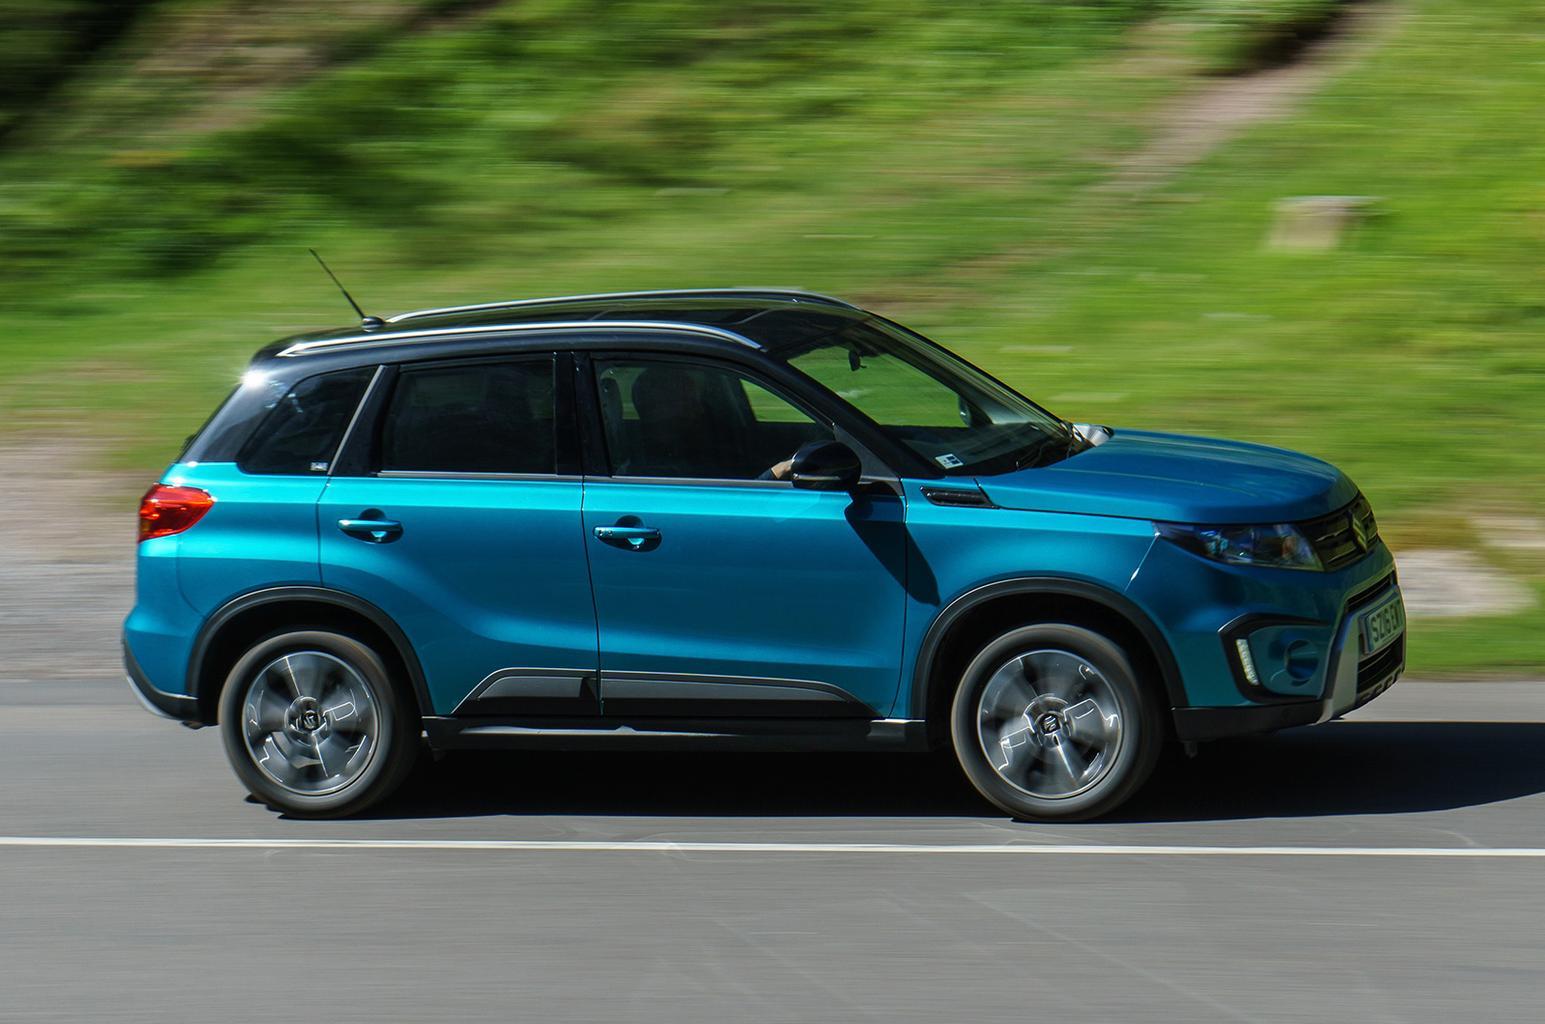 How to spec a Suzuki Vitara